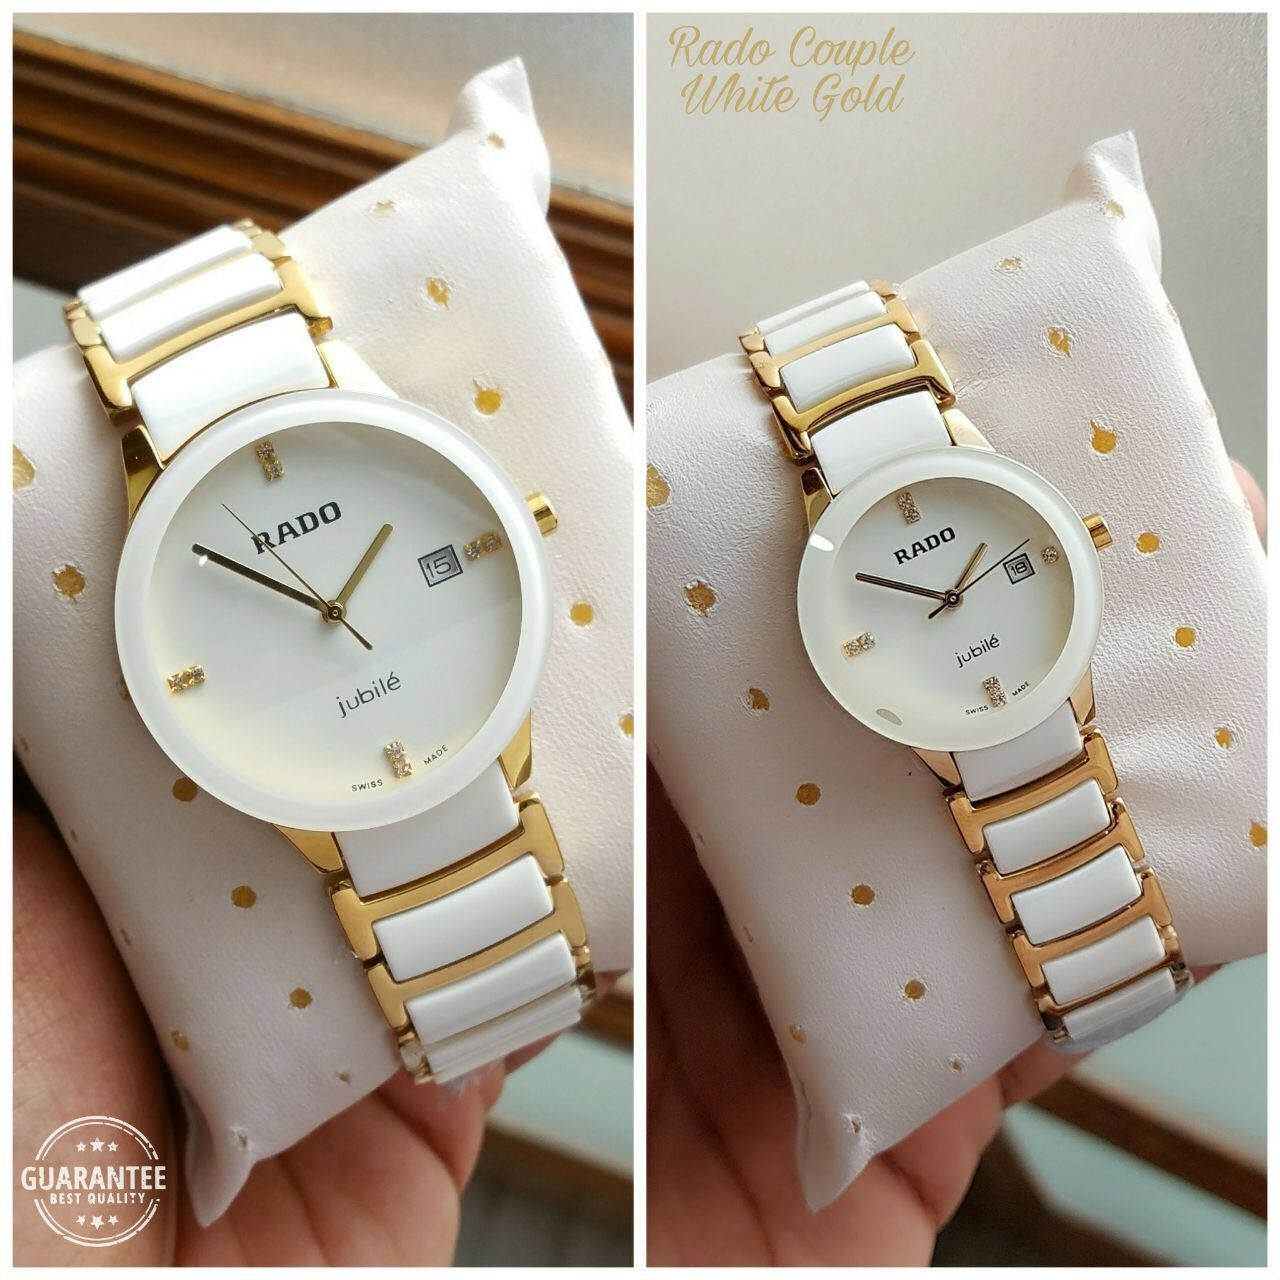 Rado Brand boxes InStock & Couple Watch Ready to ship